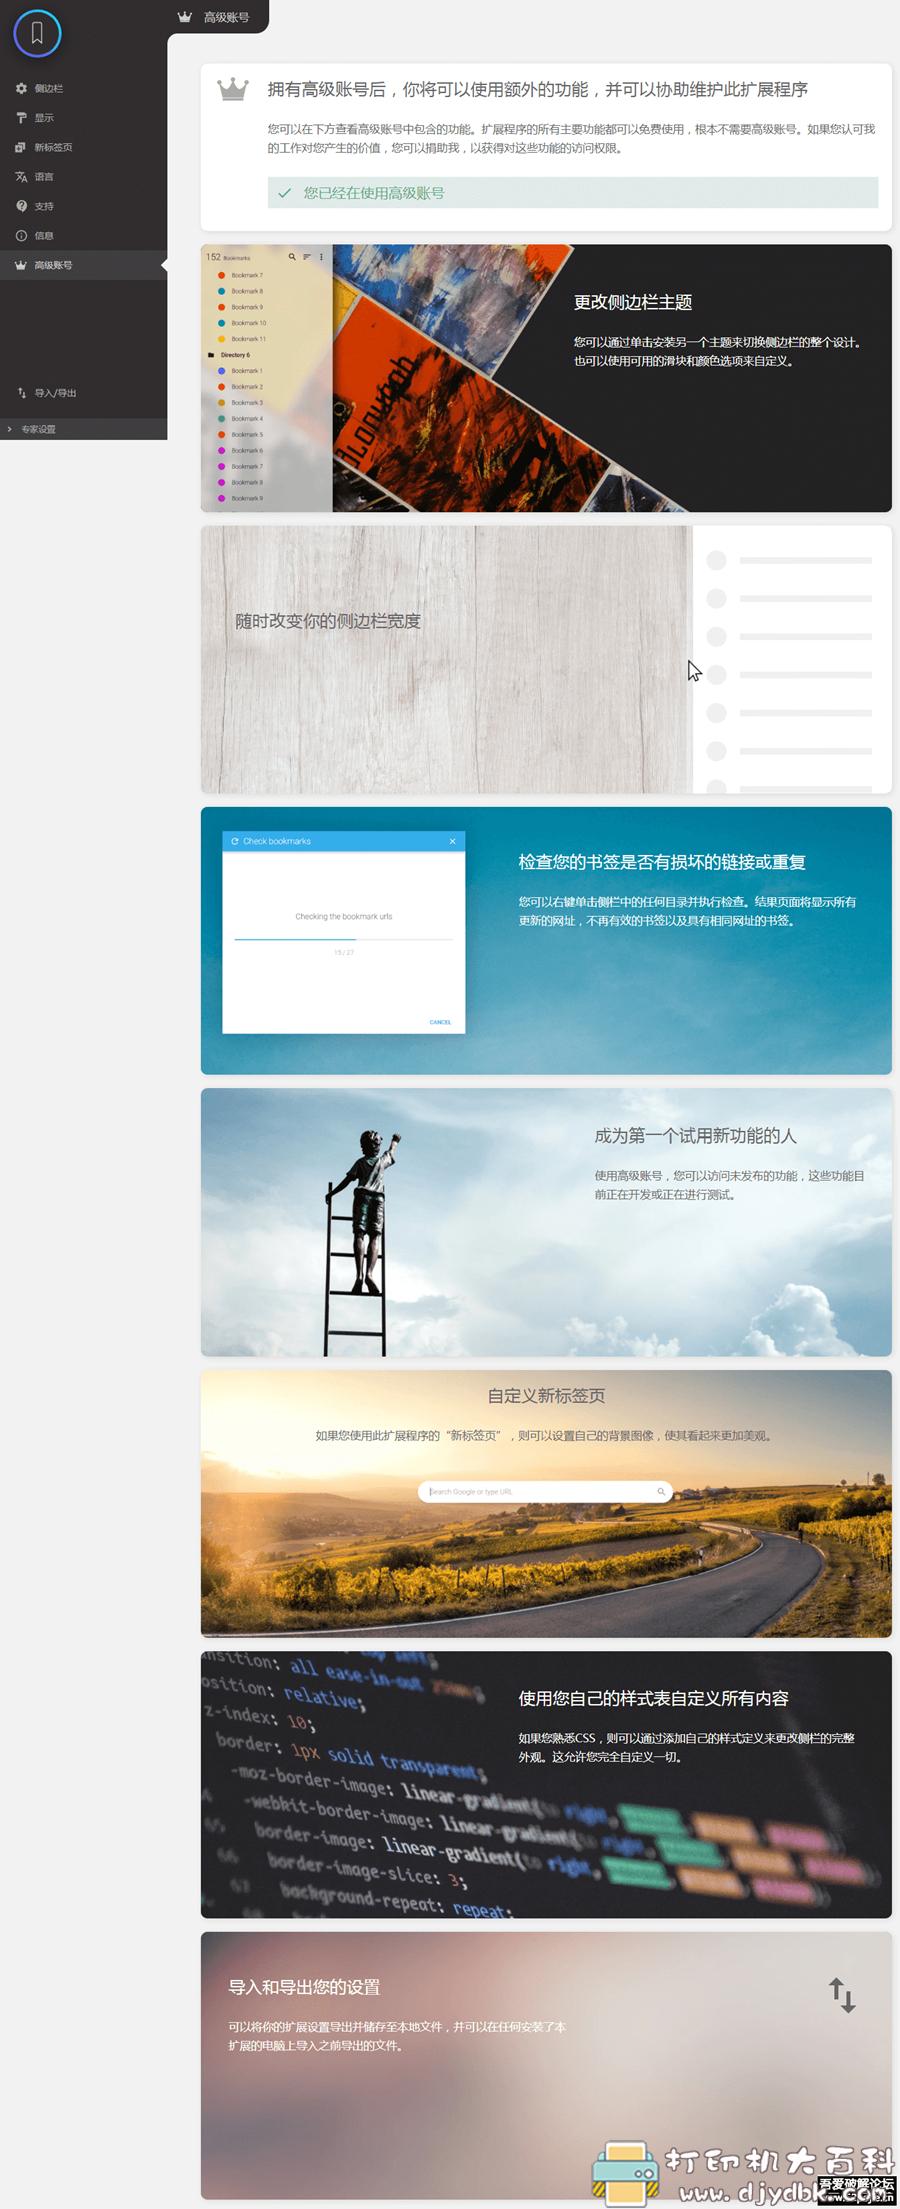 [Chrome插件]书签侧边栏 pro修改版图片 No.5